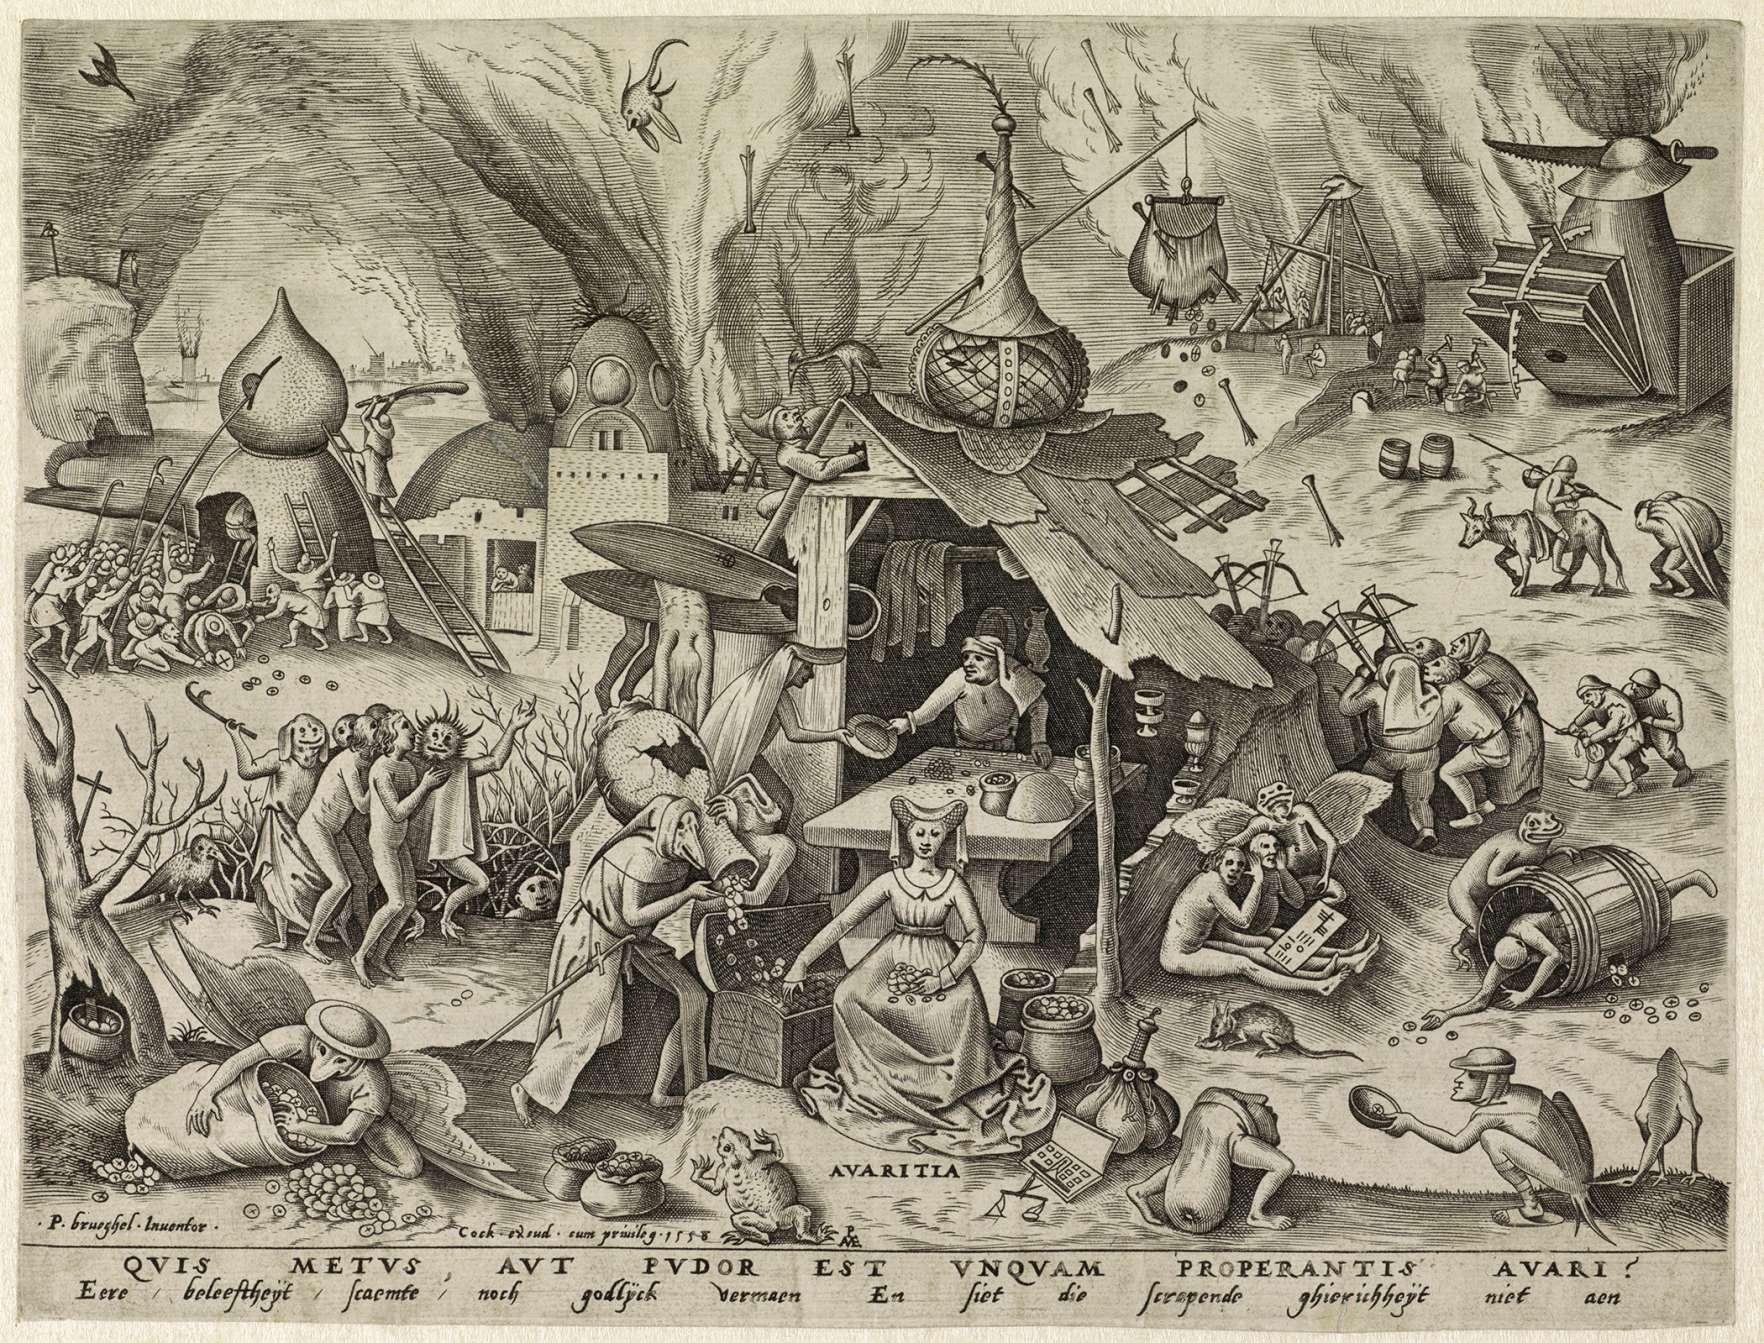 """Avarita (Greed),"" Pieter van der Heyden after Pieter Bruegel the Elder, engraving, 1558, Rijksmuseum, Amsterdam"